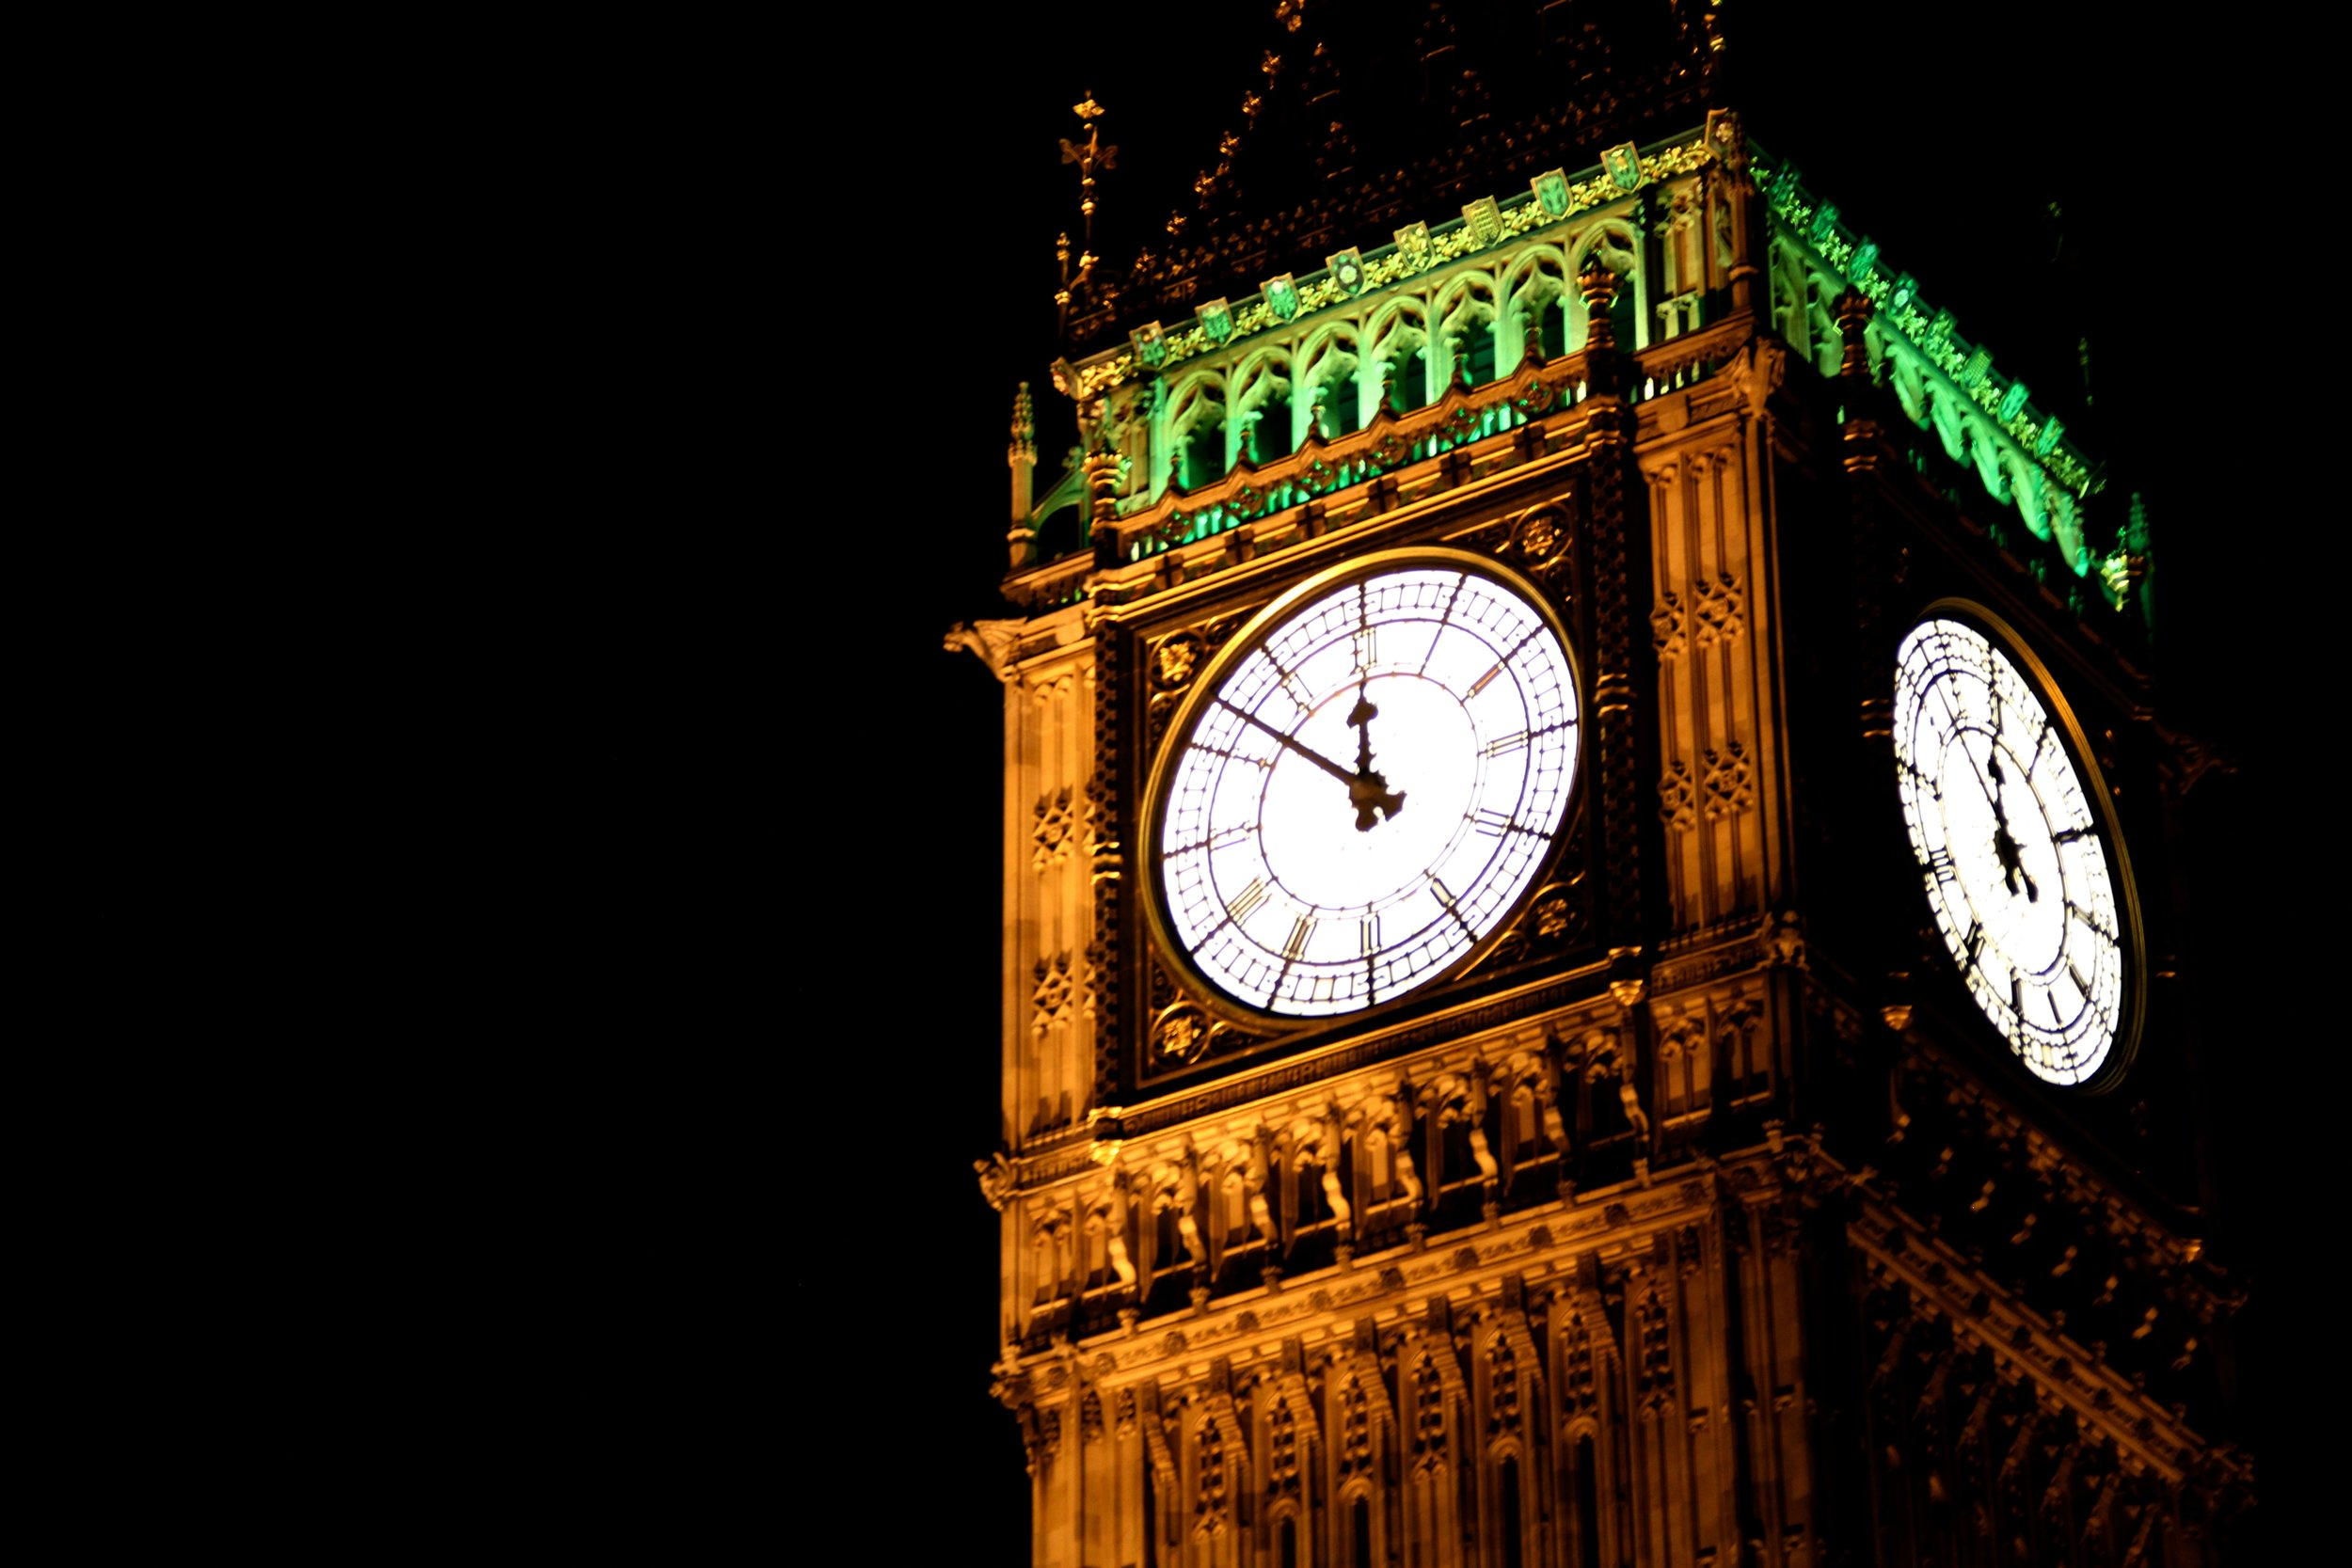 2016.09 London Edited 8107.jpg